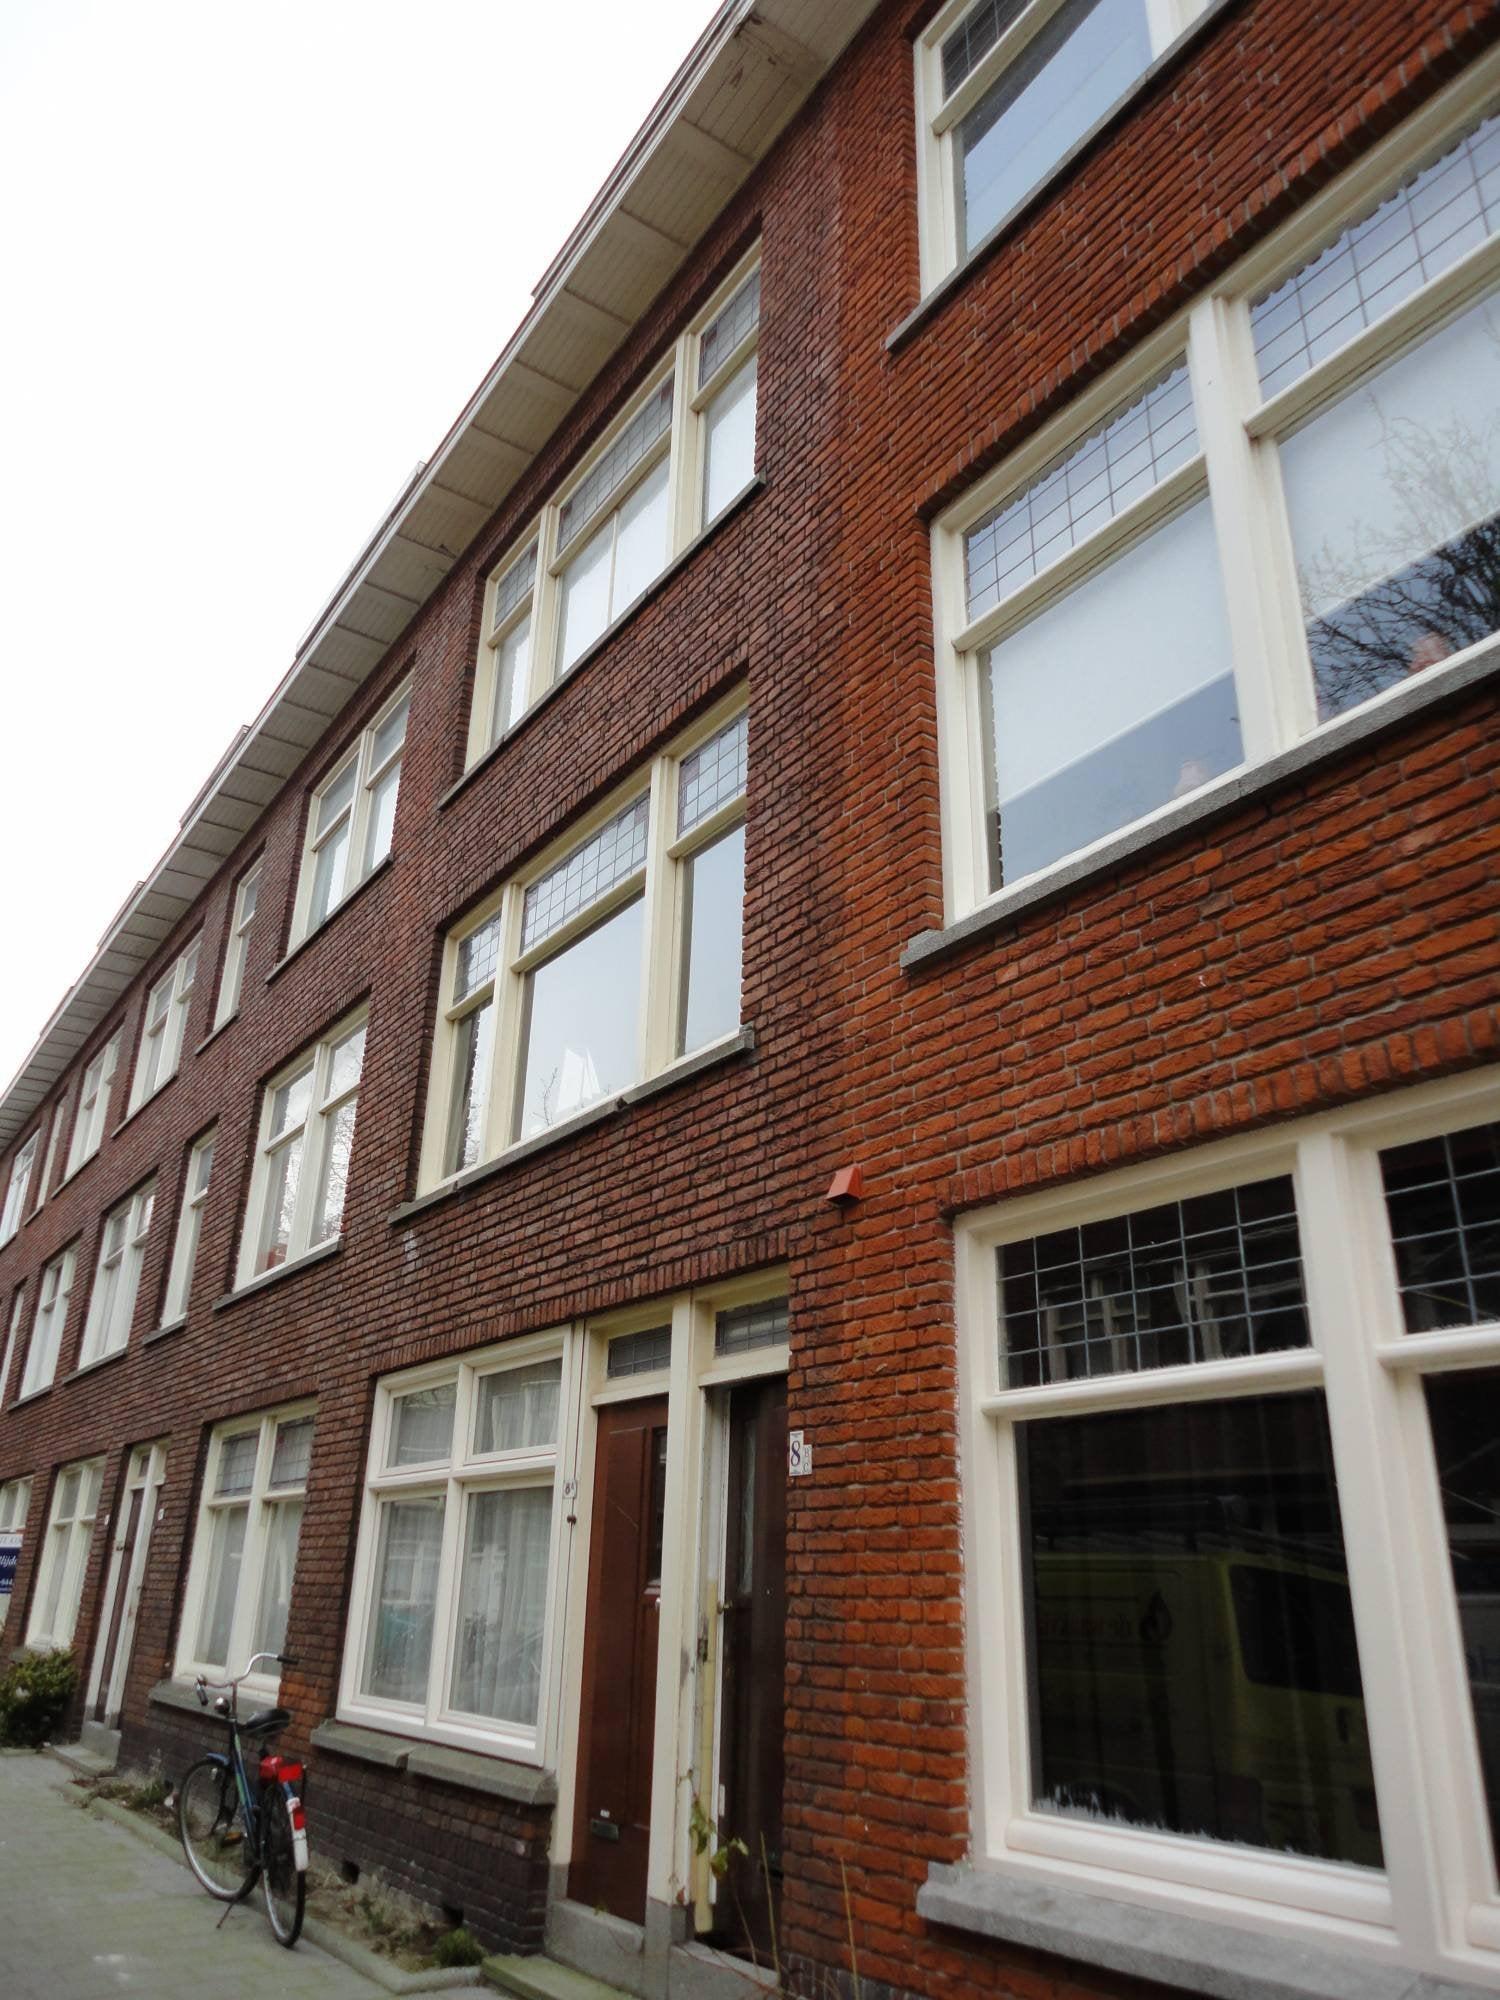 Geertsemastraat, Rotterdam